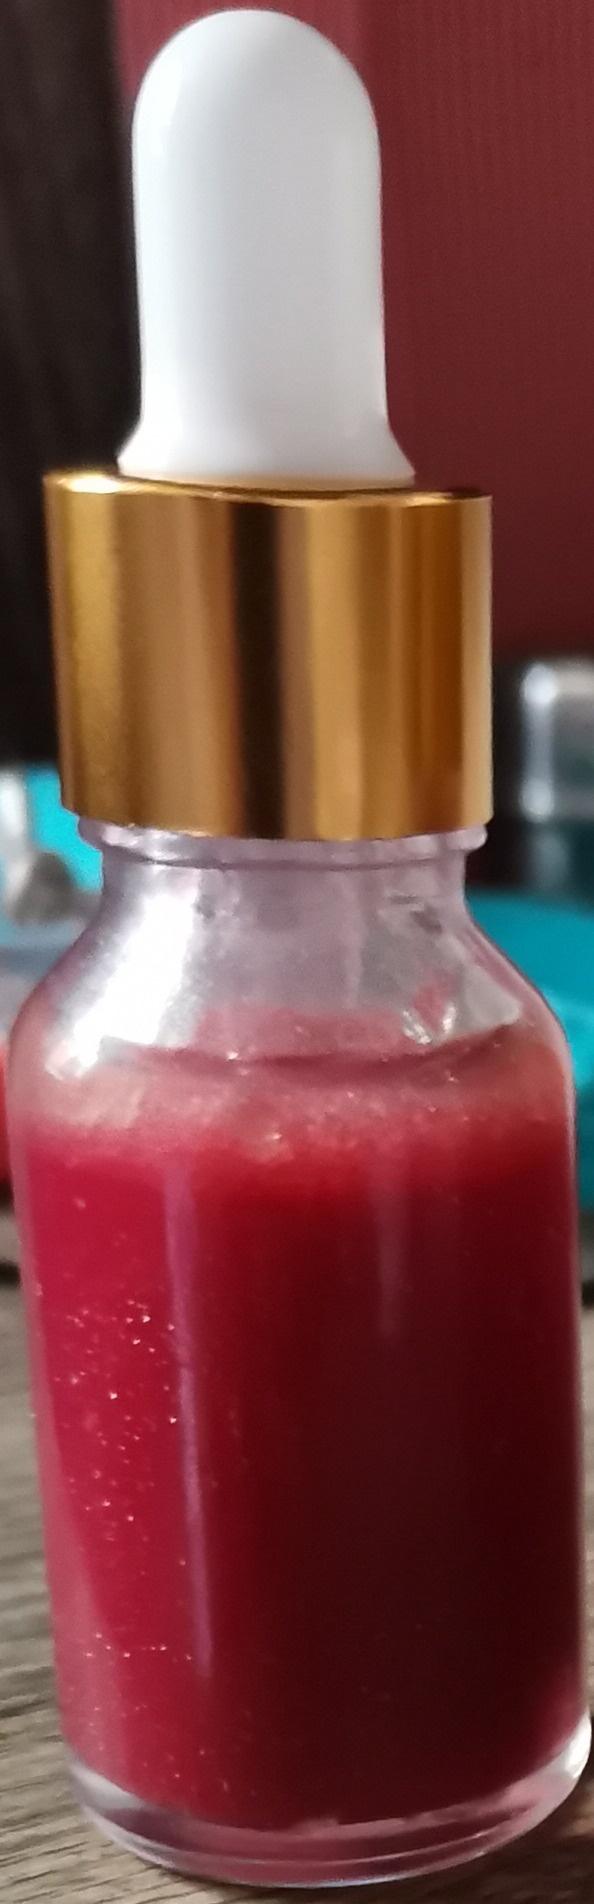 Nayaa Beauty Care Beetroot Glow Serum